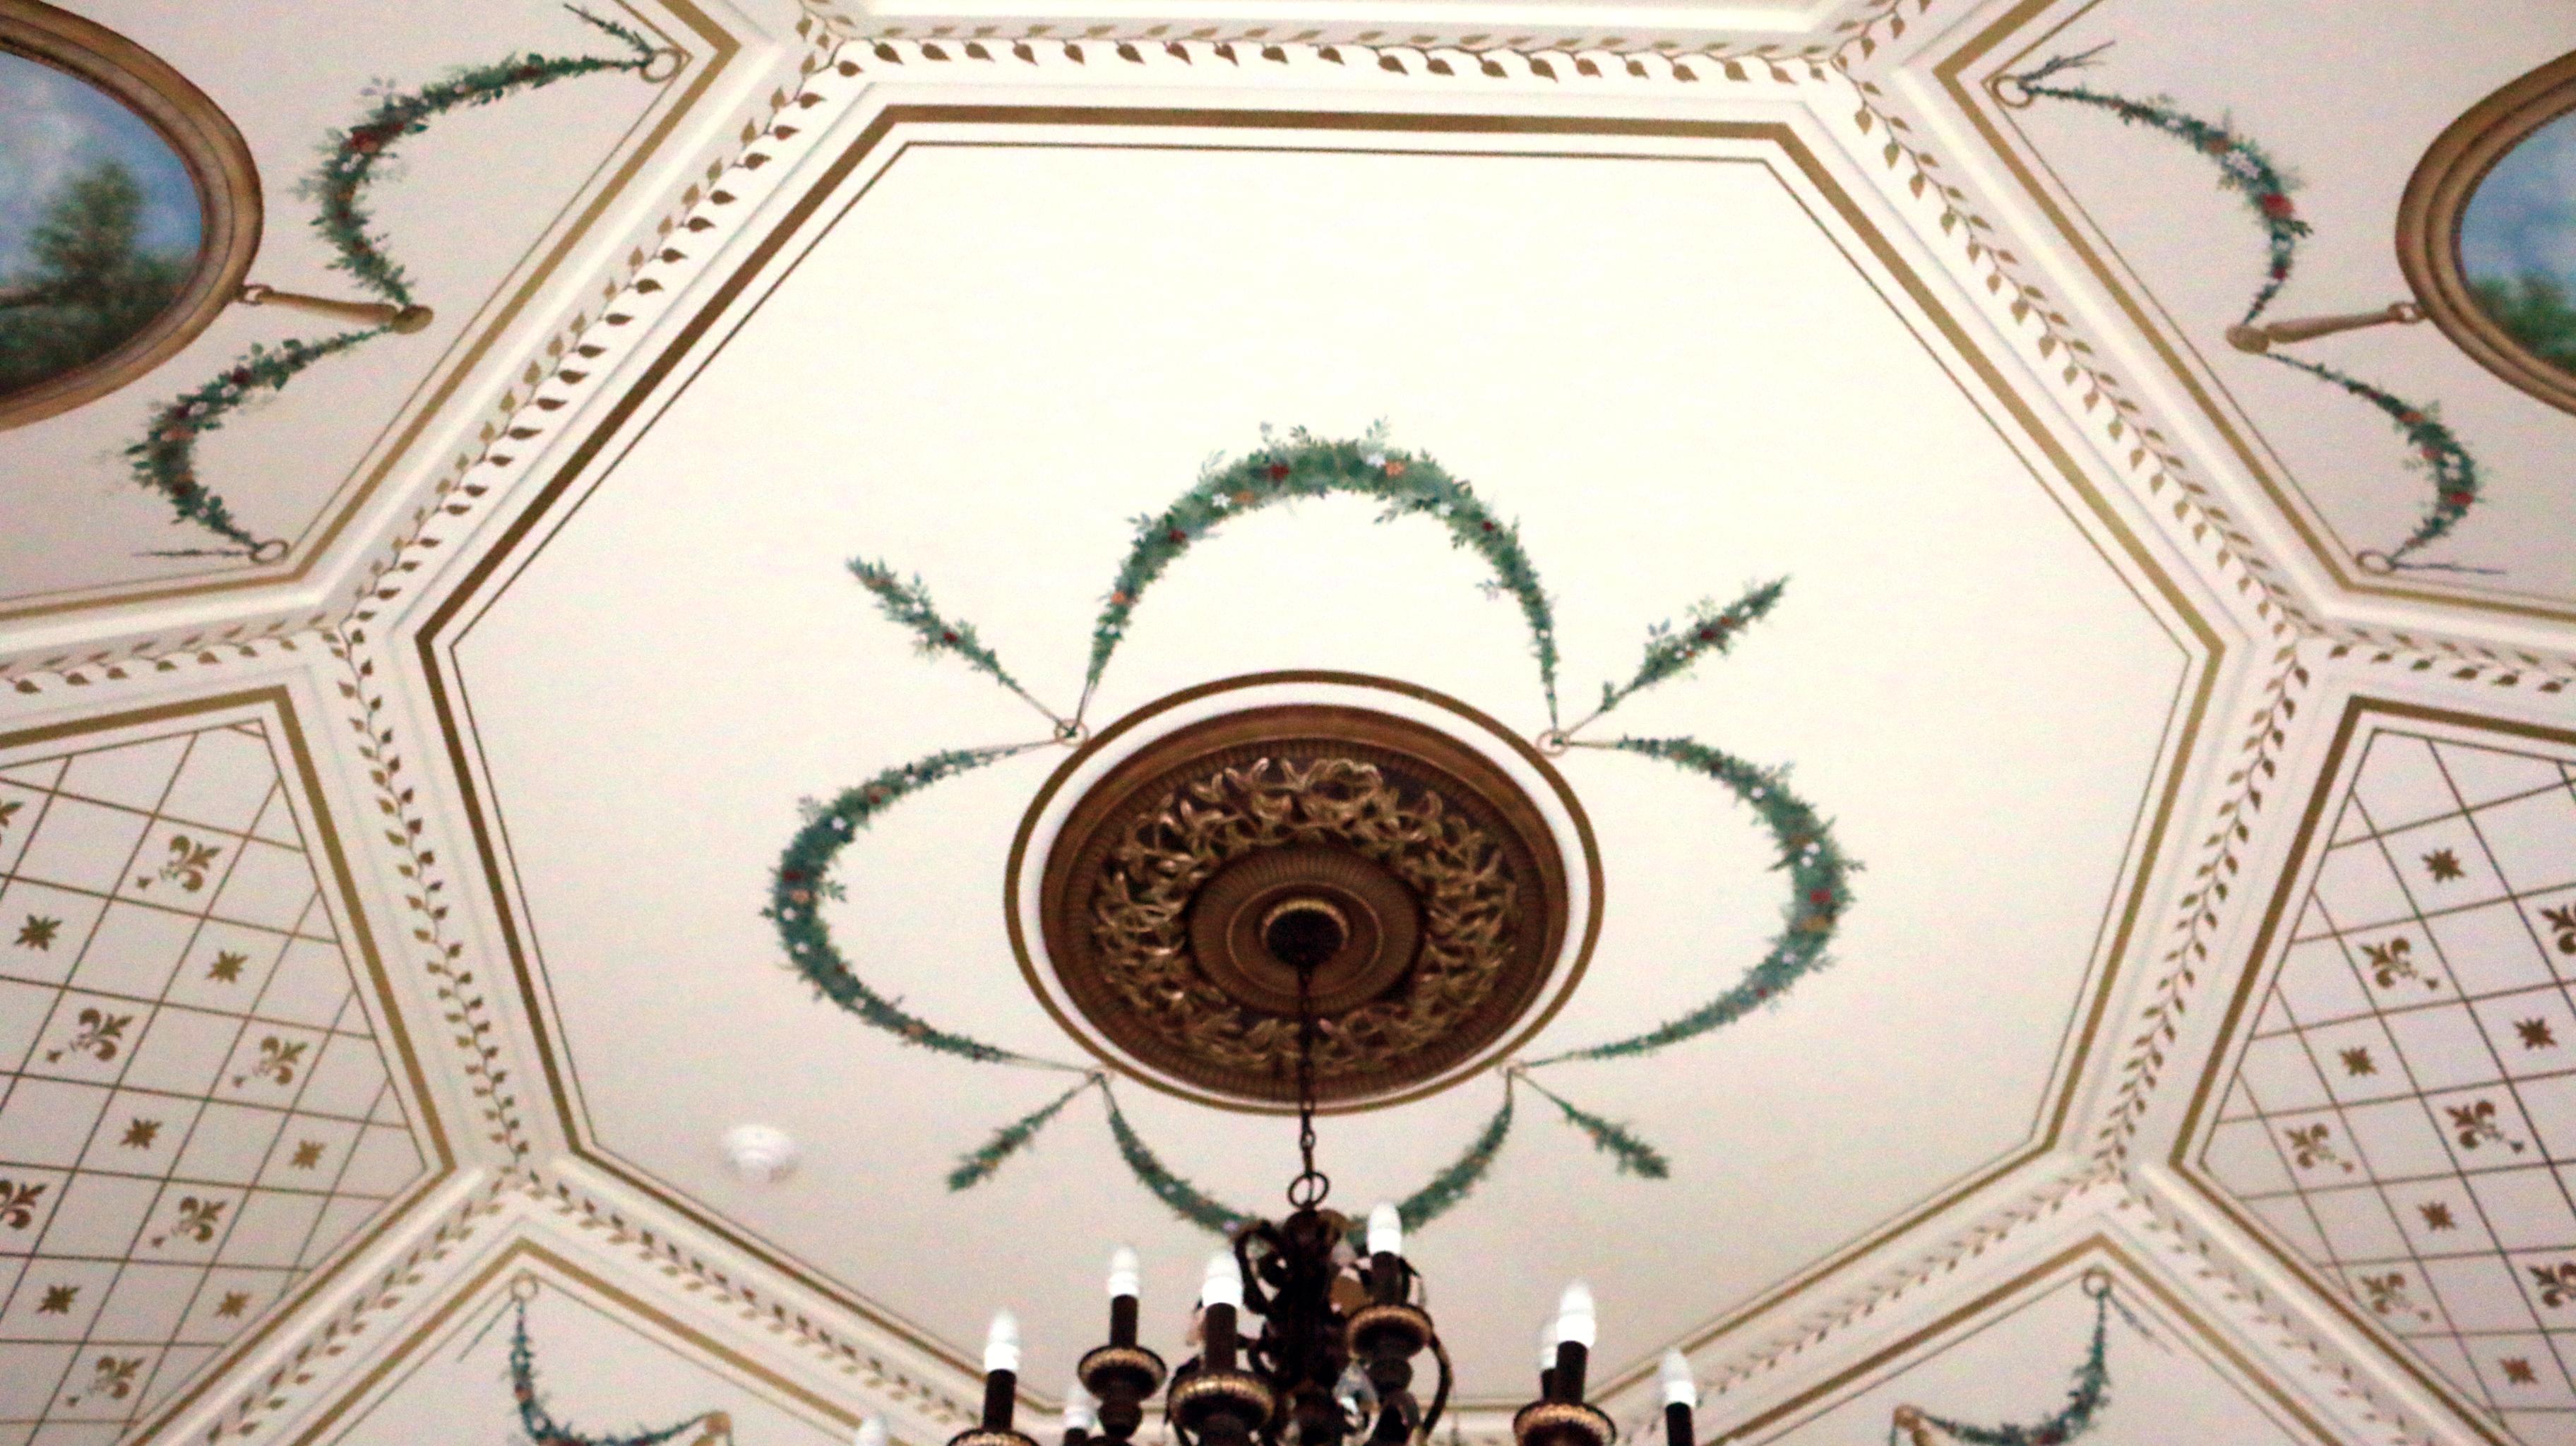 Mural & Ceiling Dome Tenafly NJ